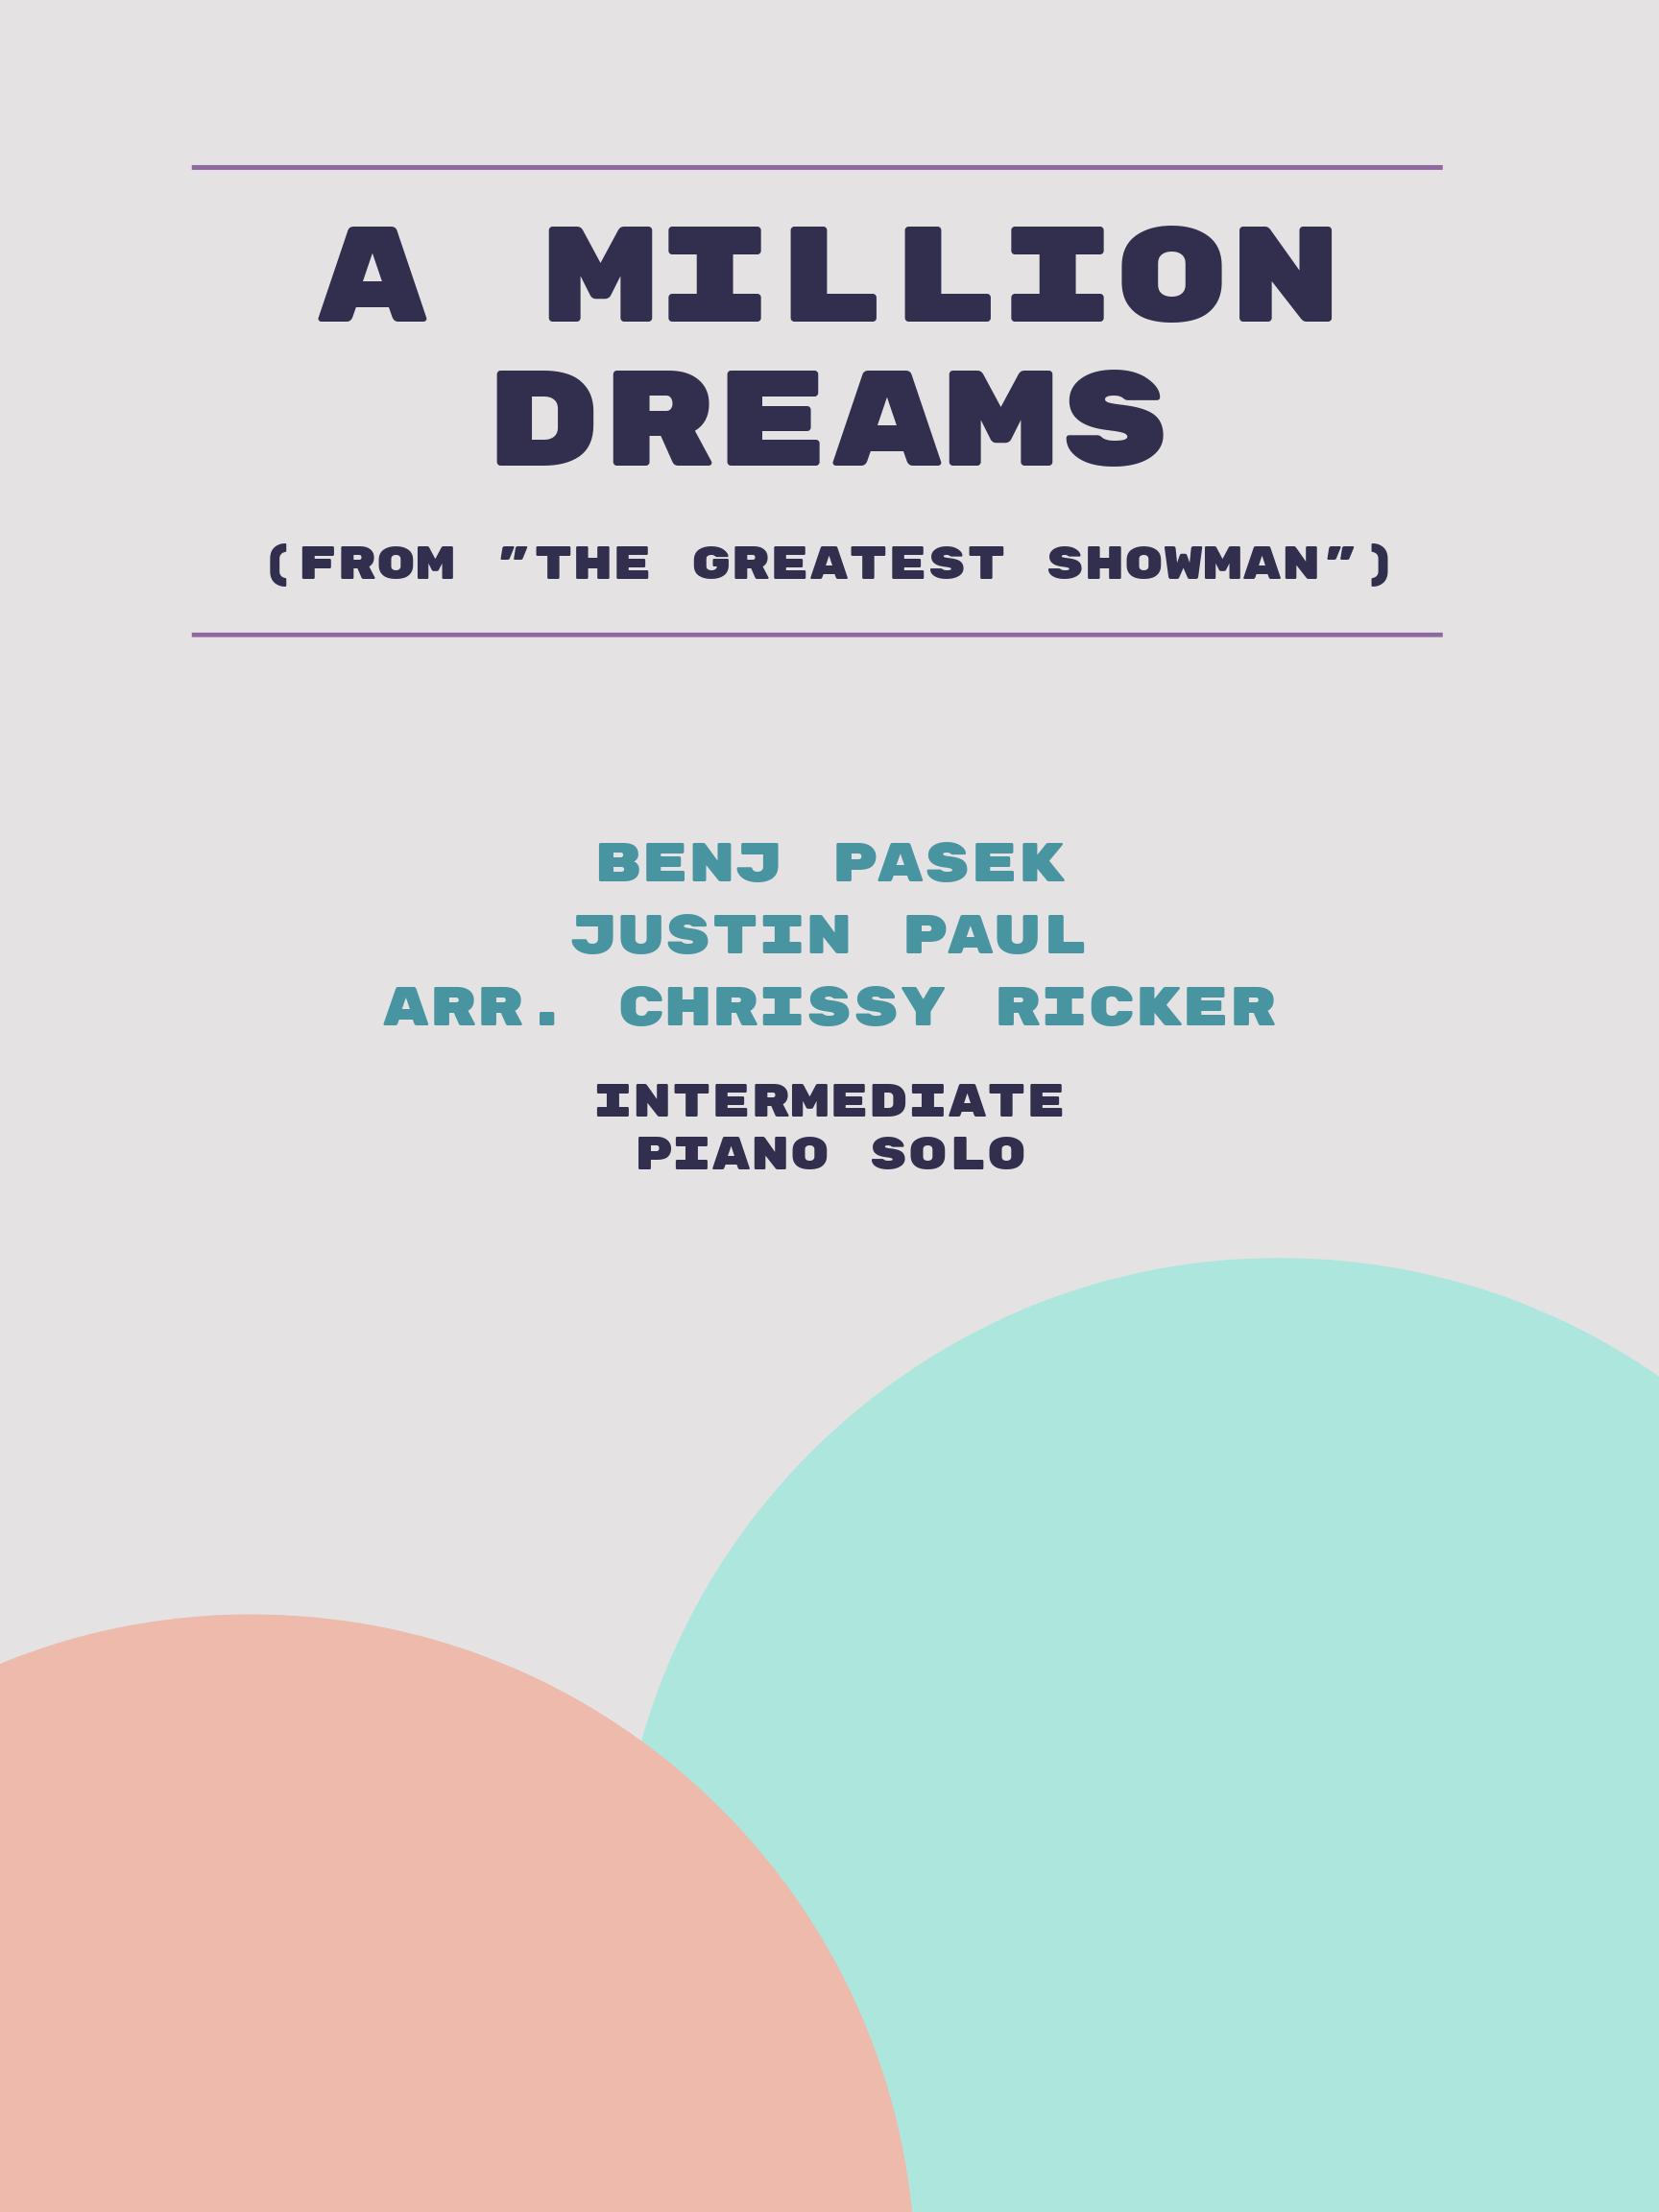 A Million Dreams by Benj Pasek, Justin Paul